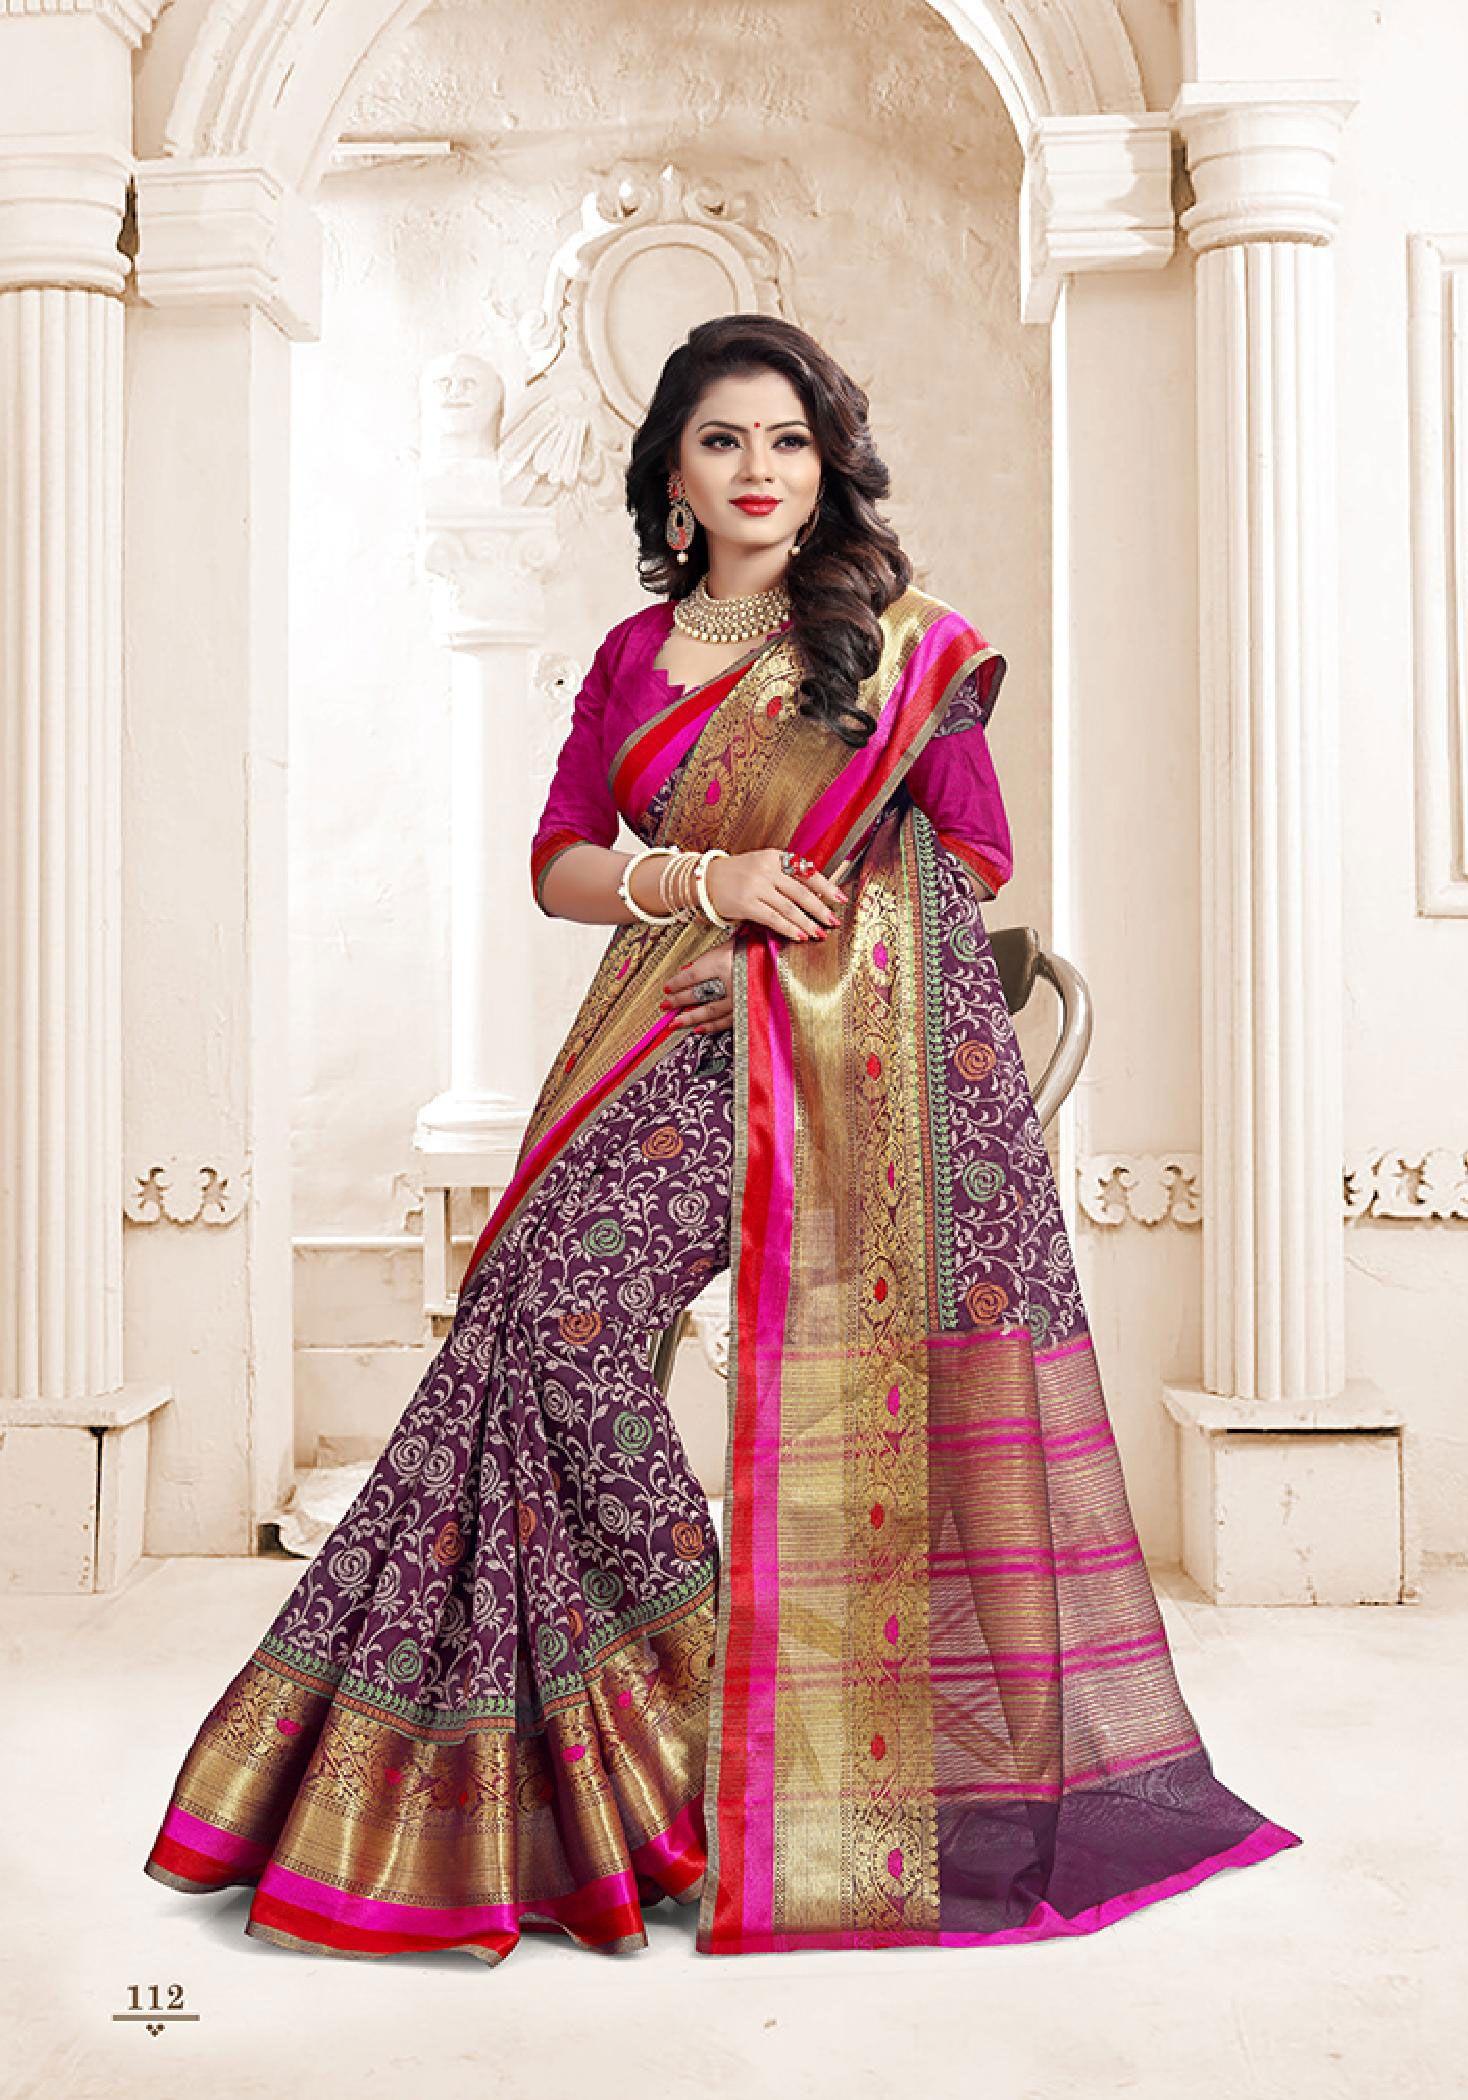 cbca688382 Buy Sethnic Wholesale pure Cotton printed saree catalog | Things to ...